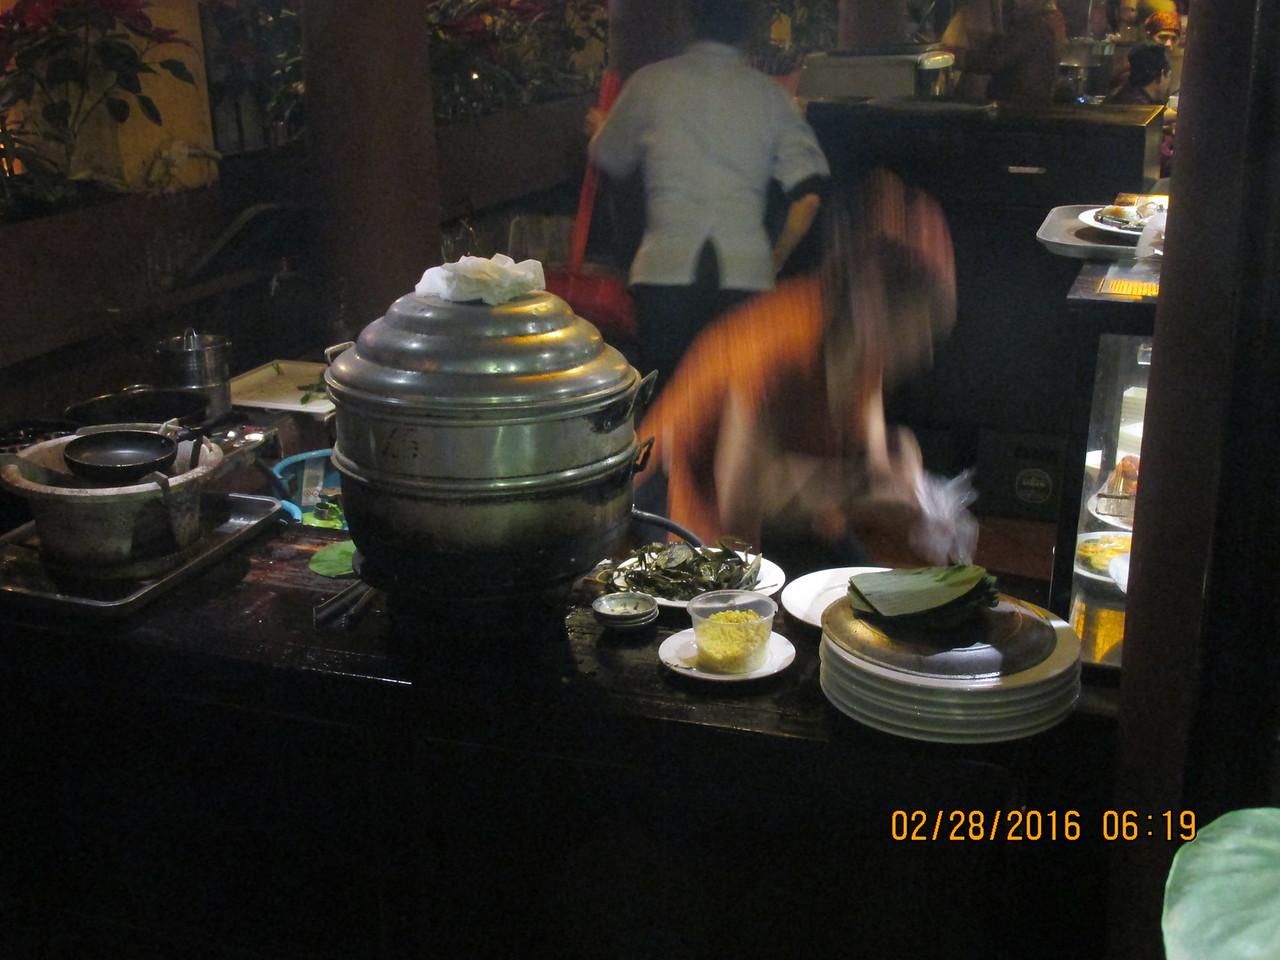 0070 - Quan An Ngon Restaurant on Phan Boi Chau - Hanoi Vietnam - Date Correct but Time on Pic is Wrong